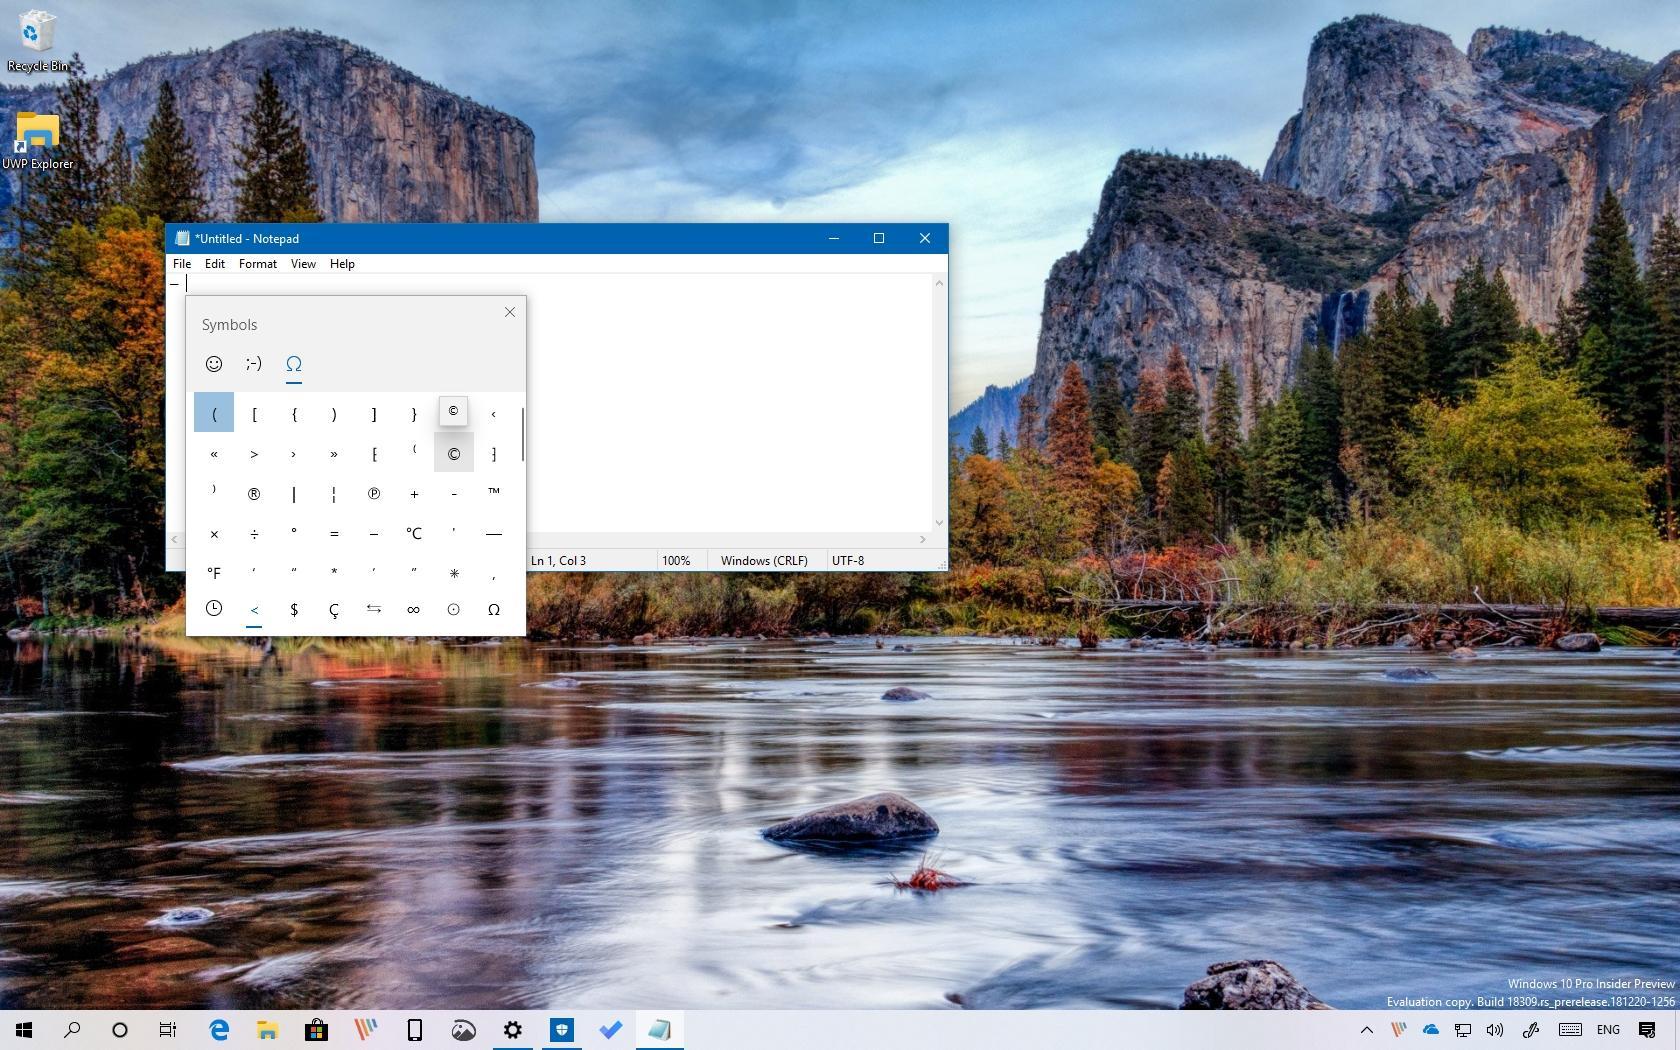 Inserting symbols on Windows 10